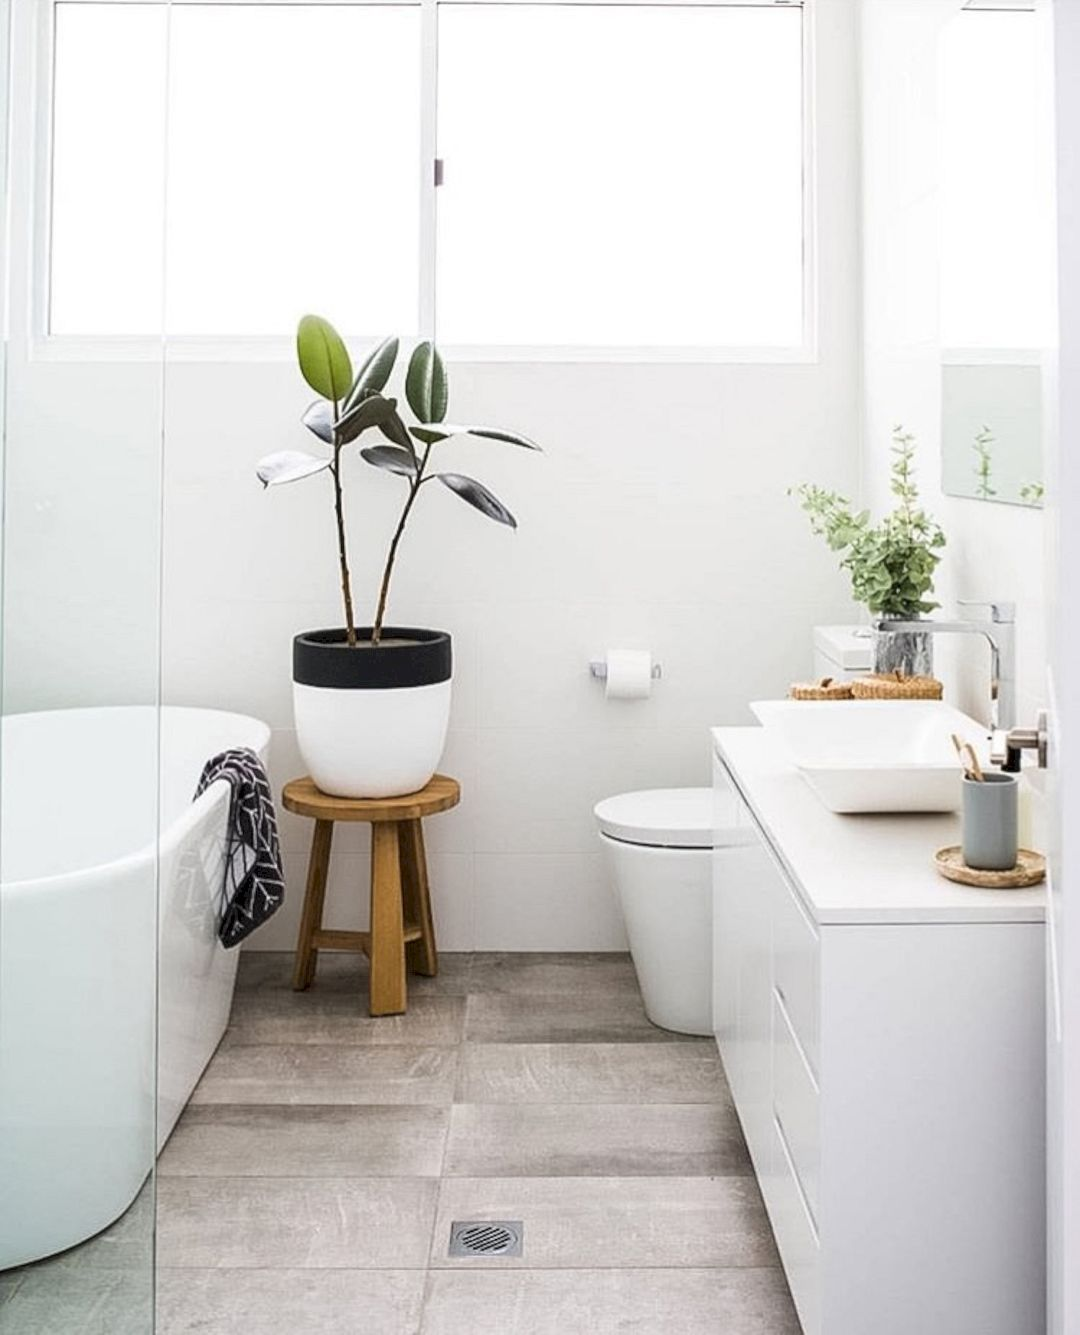 Best Small Bathroom Remodel: 111 Design Ideas | Small bathroom ... on new pool designs, new small kitchens, new bathroom light fixtures, new decor designs, masterbath designs, new simple designs, new bathroom colors, new bathroom showers, new bathroom ideas, small bath tile designs, new desk designs, new small ideas, small shower designs, new furniture designs, new apartment designs, new bath designs, new retro bathroom, new small home designs, new small garden, new bathroom sink,